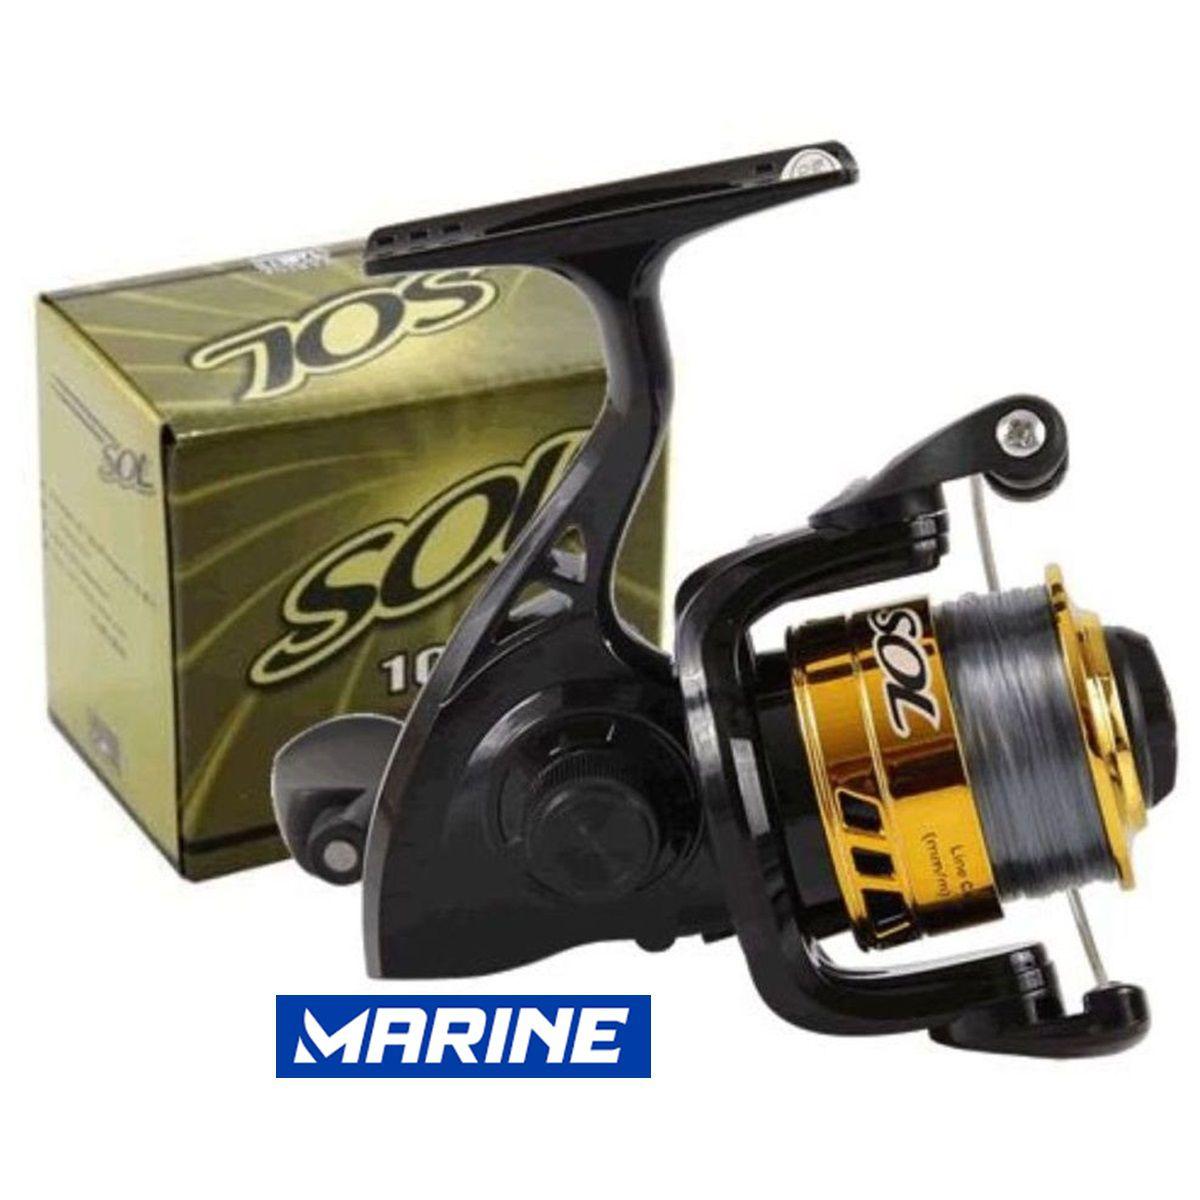 Kit De Pesca Pescaria Completa Vara 1,50 Molinete E 50 Itens